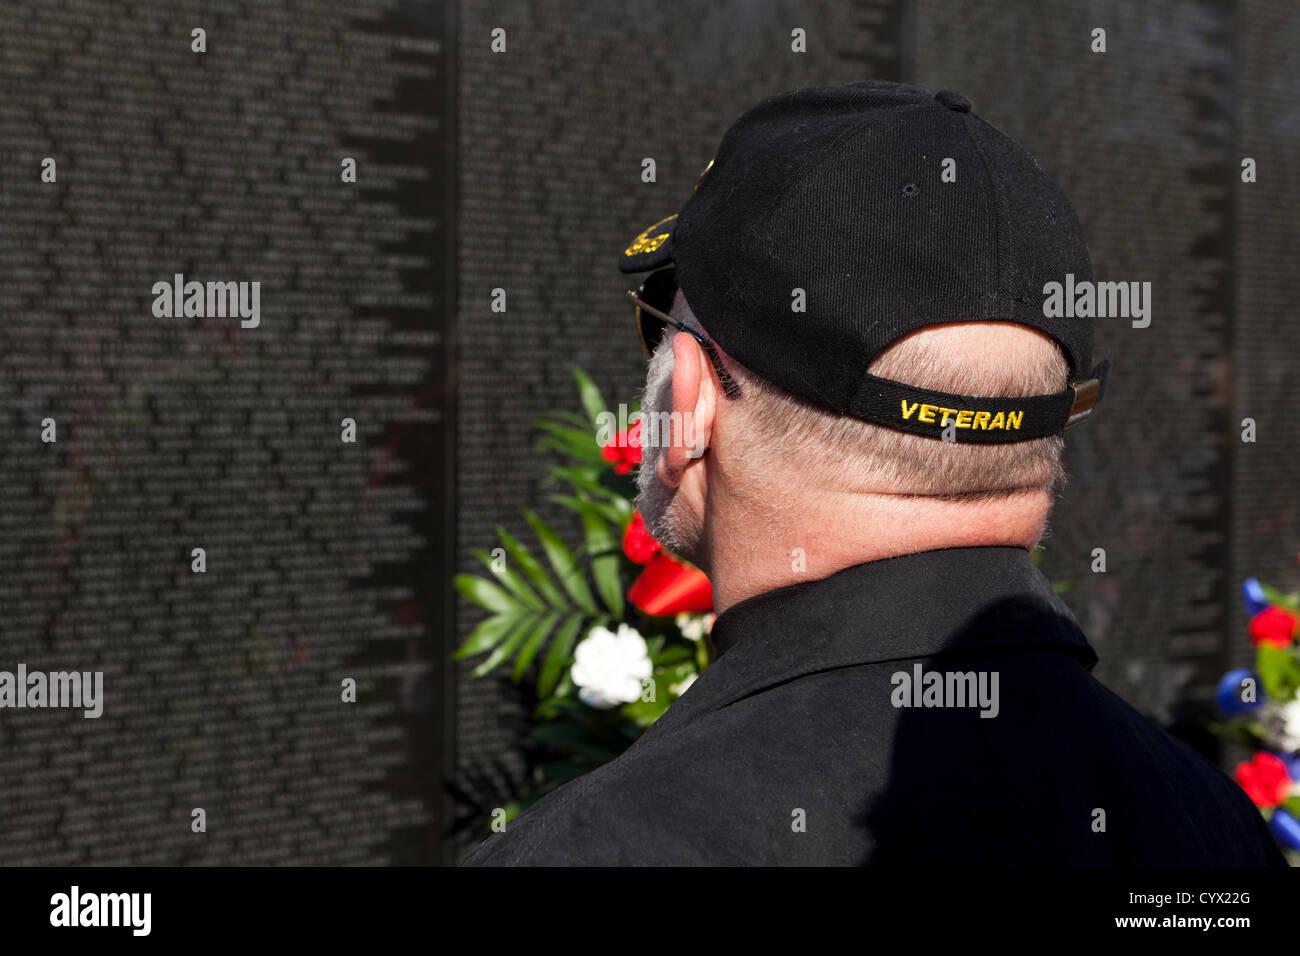 November 11, 2012: A veteran searches for a fallen soldier's name on the Vietnam War Memorial - Washington, - Stock Image